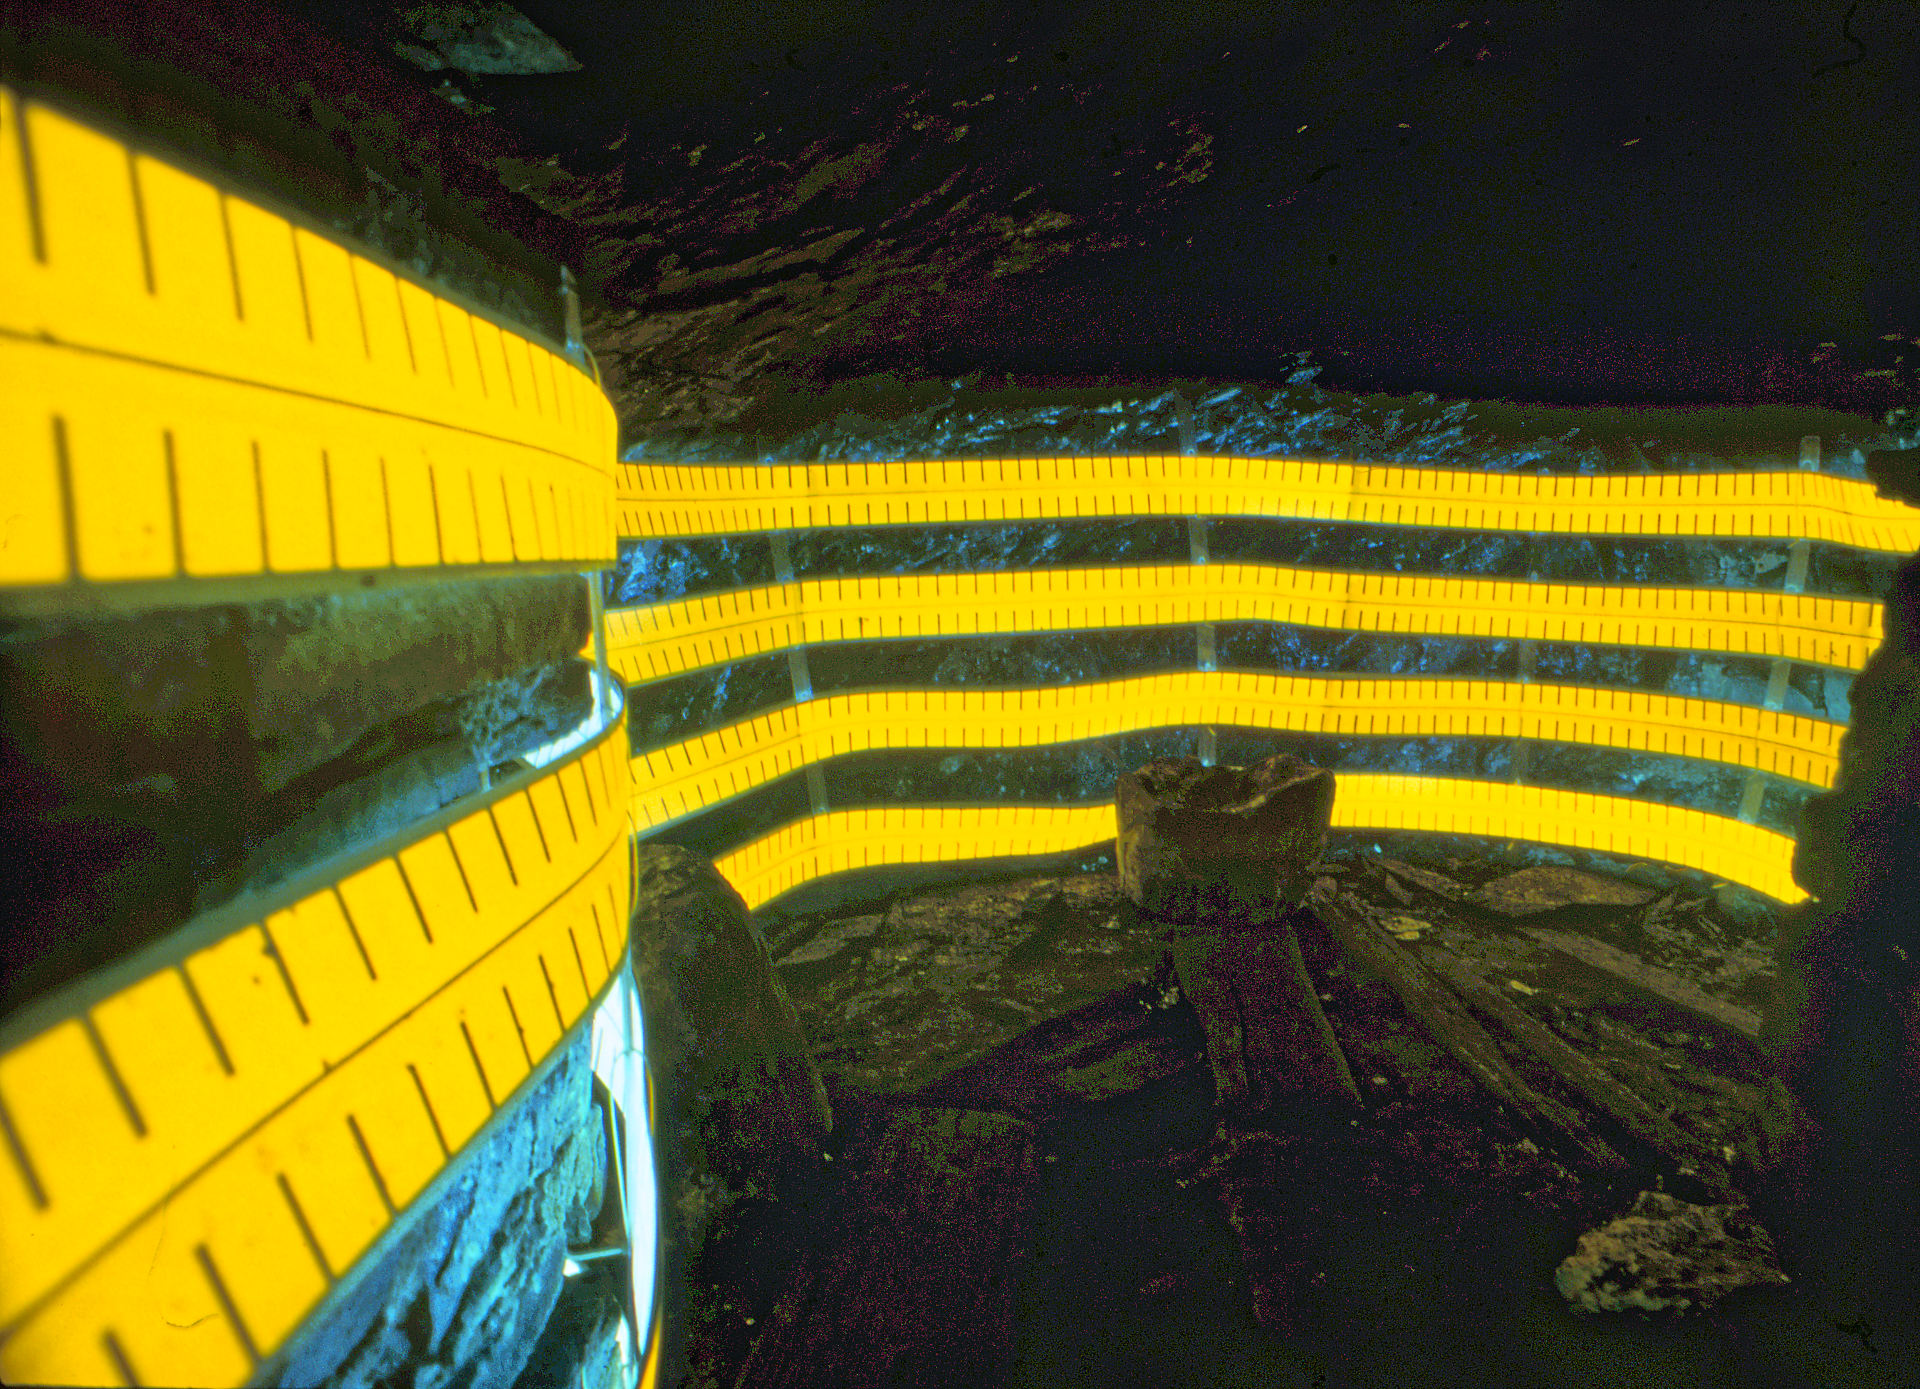 daniel_hausig_stromdiebstahl_unter_Tage_2001_light-art-installation